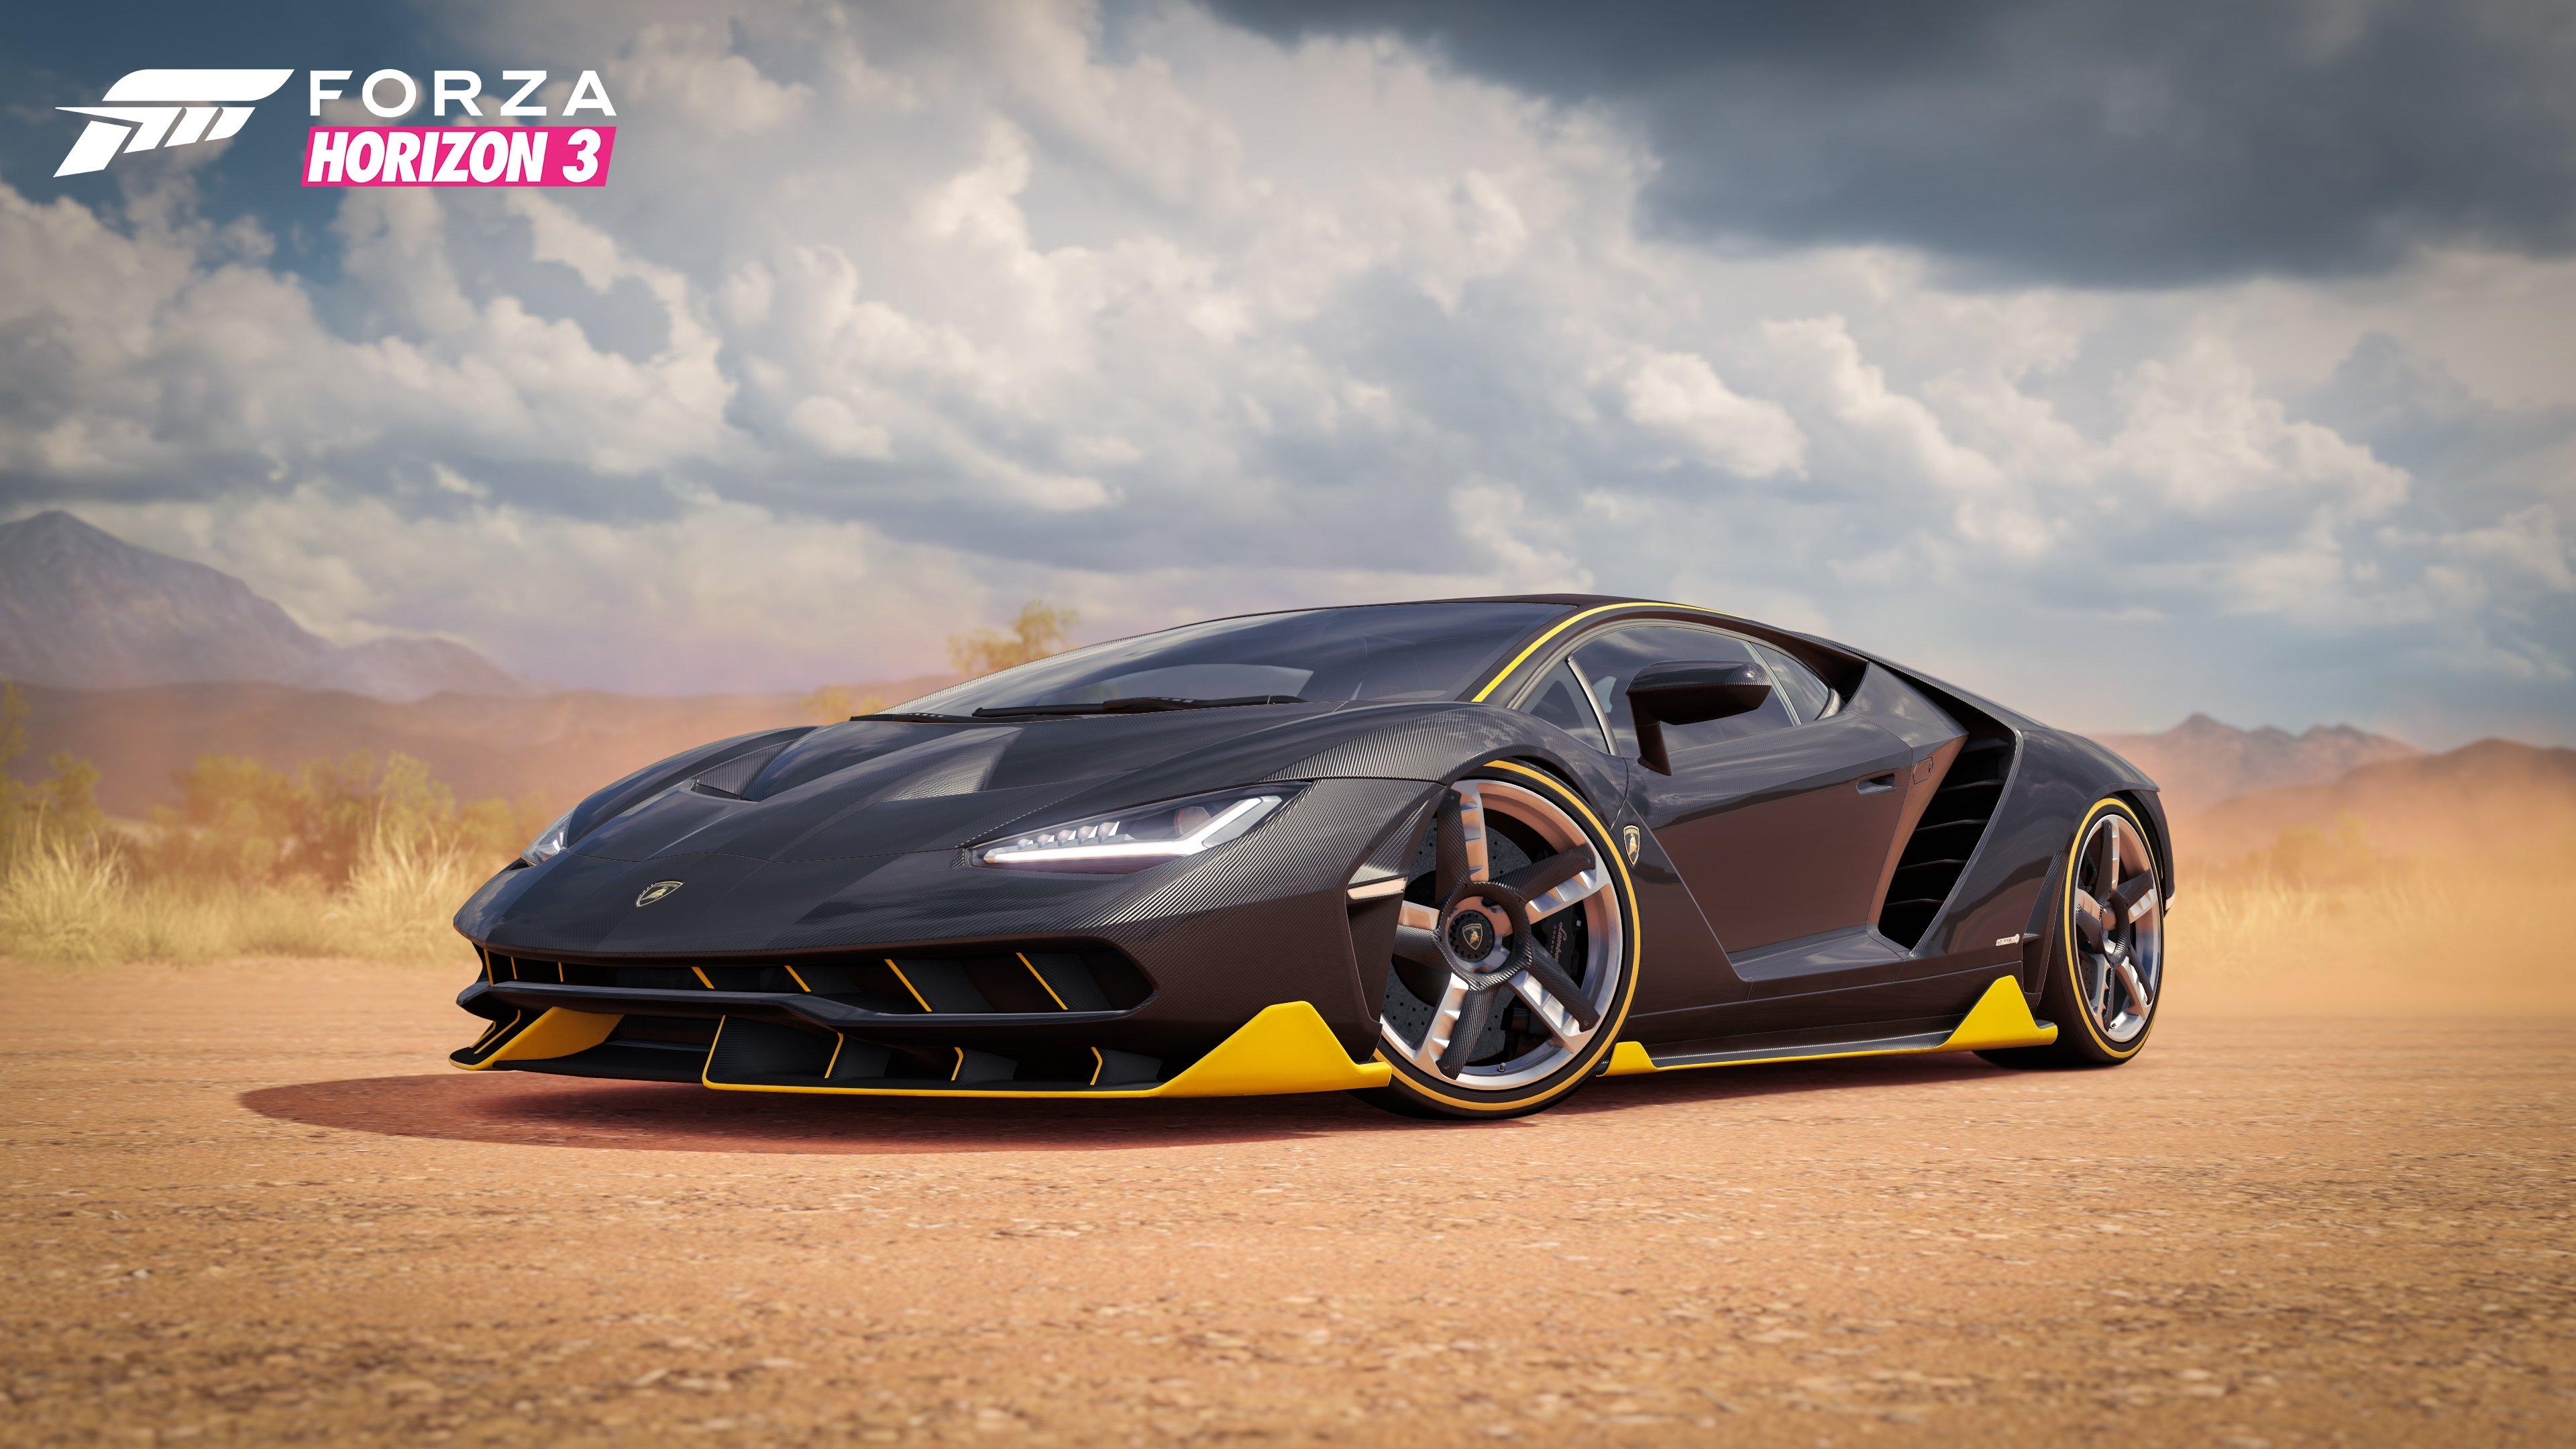 50 Lamborghini Centenario Hd Wallpapers Background Images